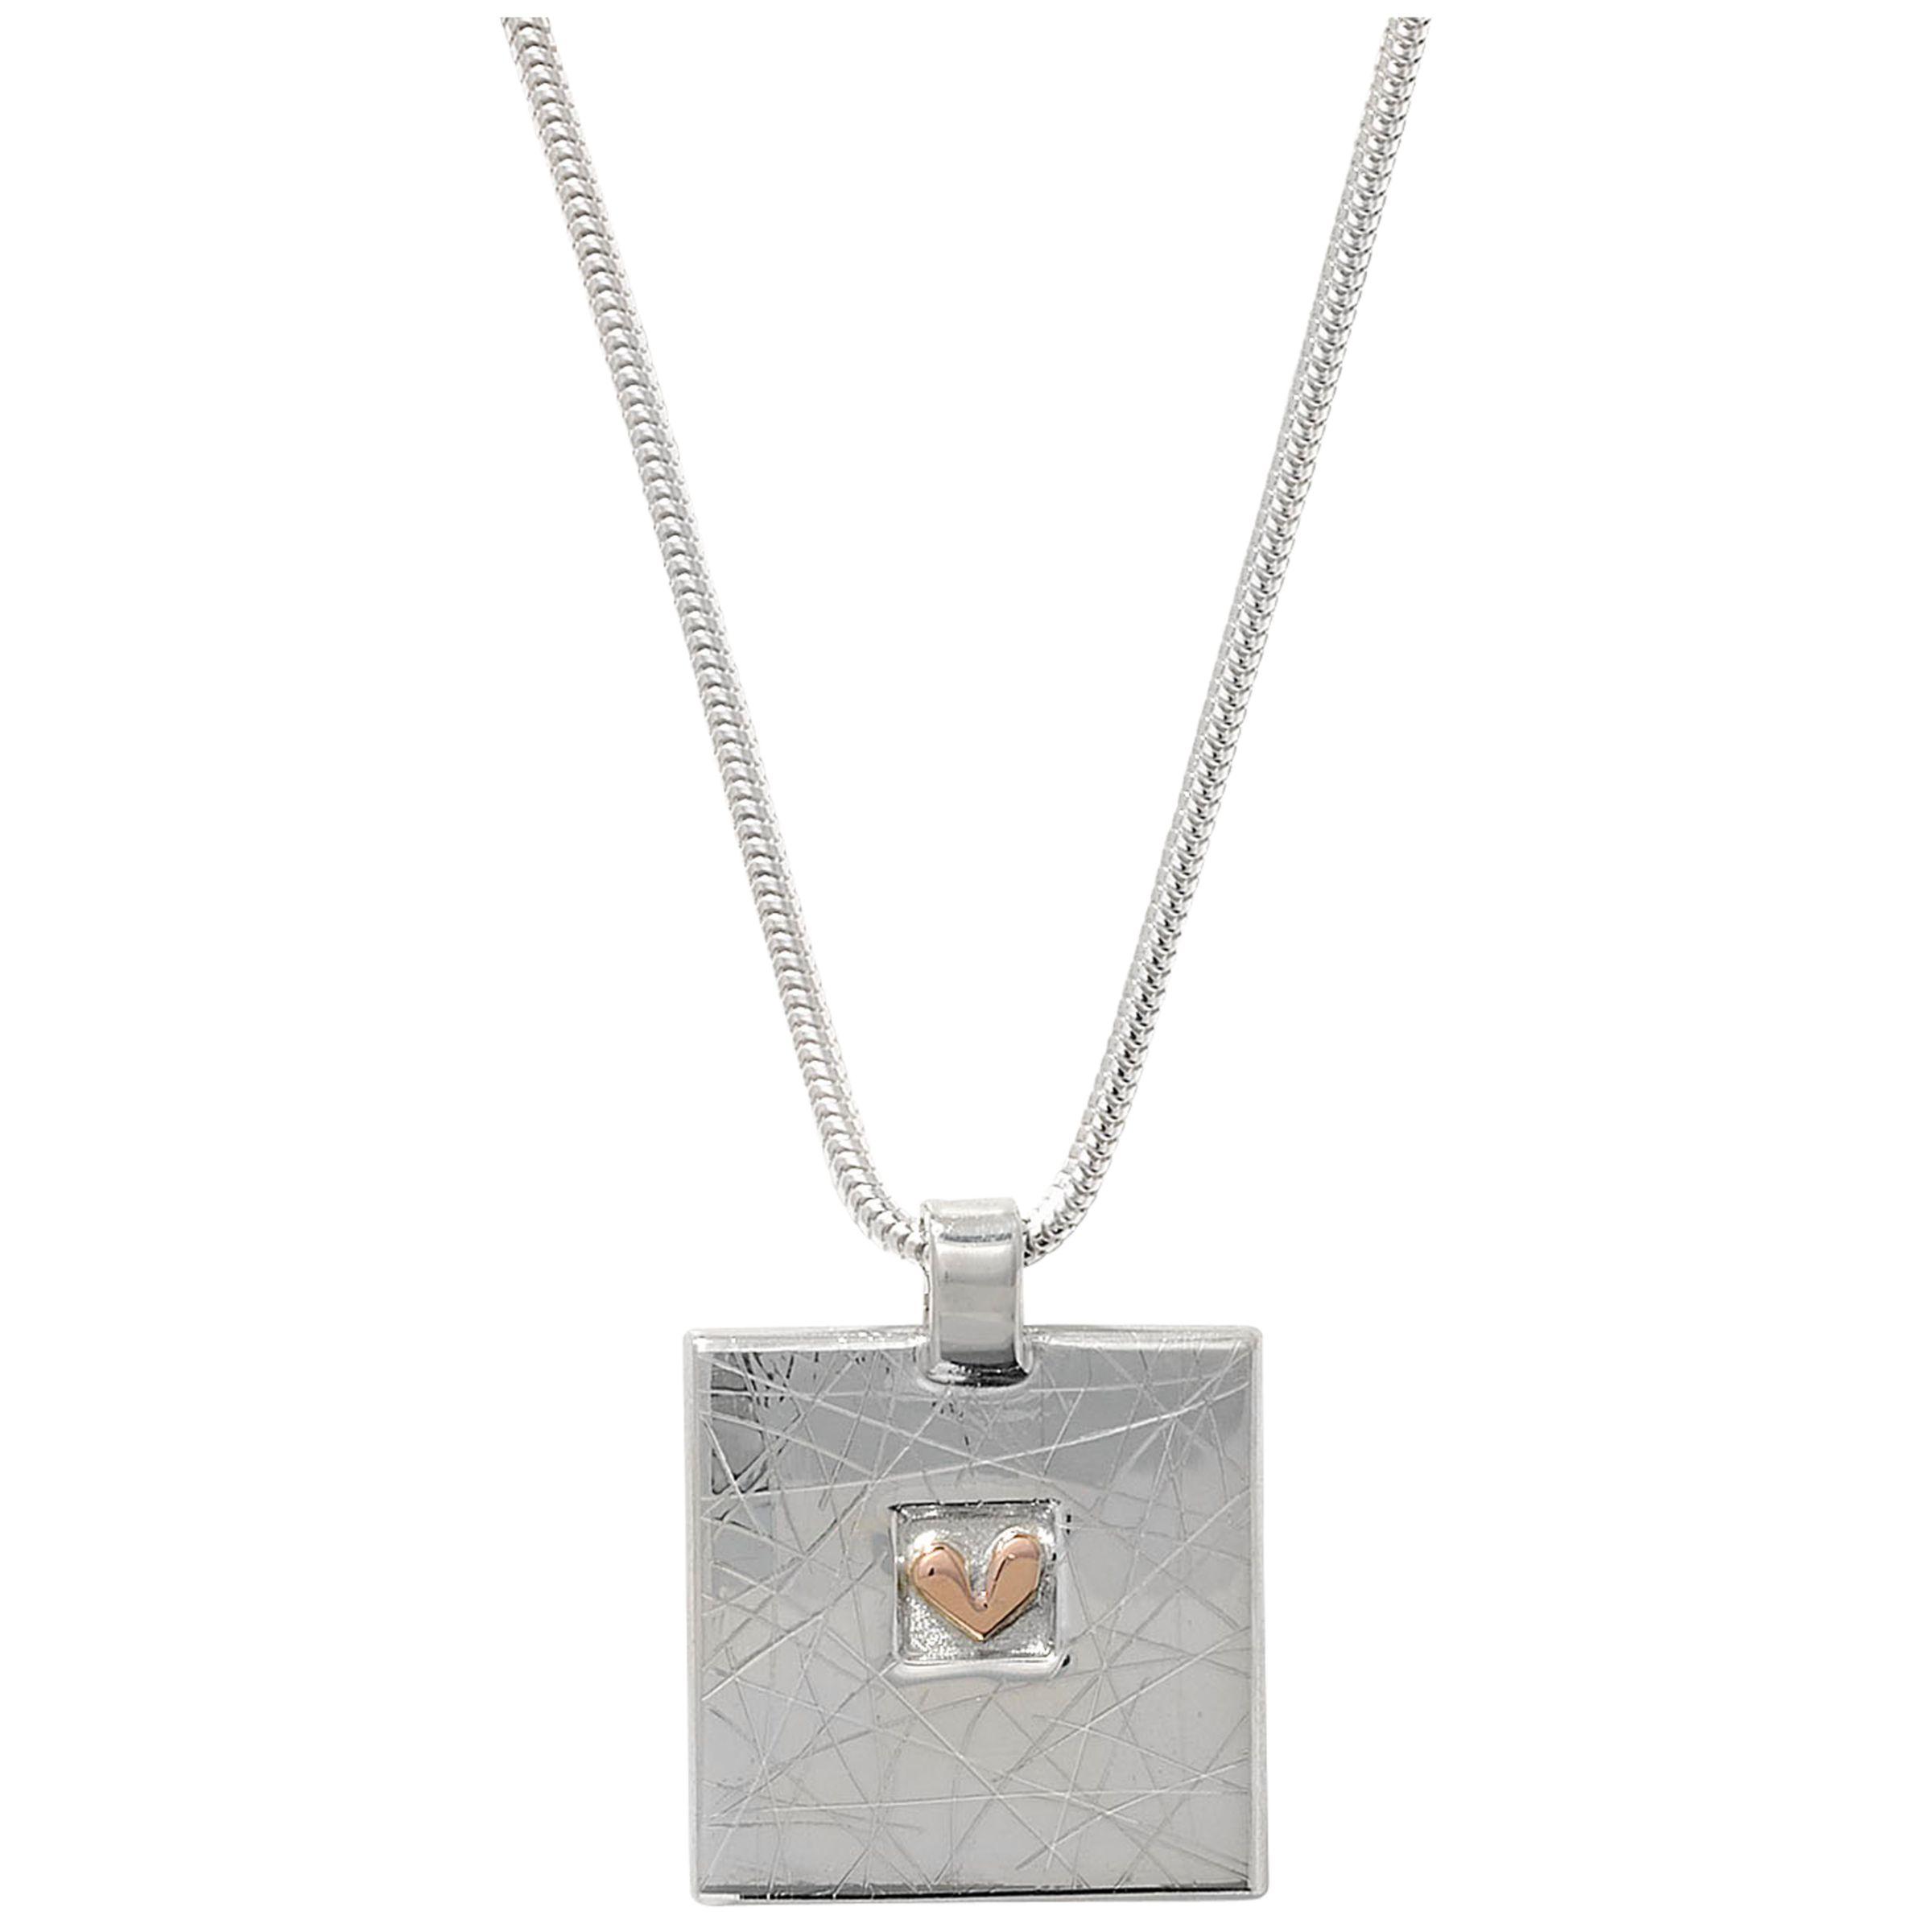 Linda Macdonald Heart Necklace